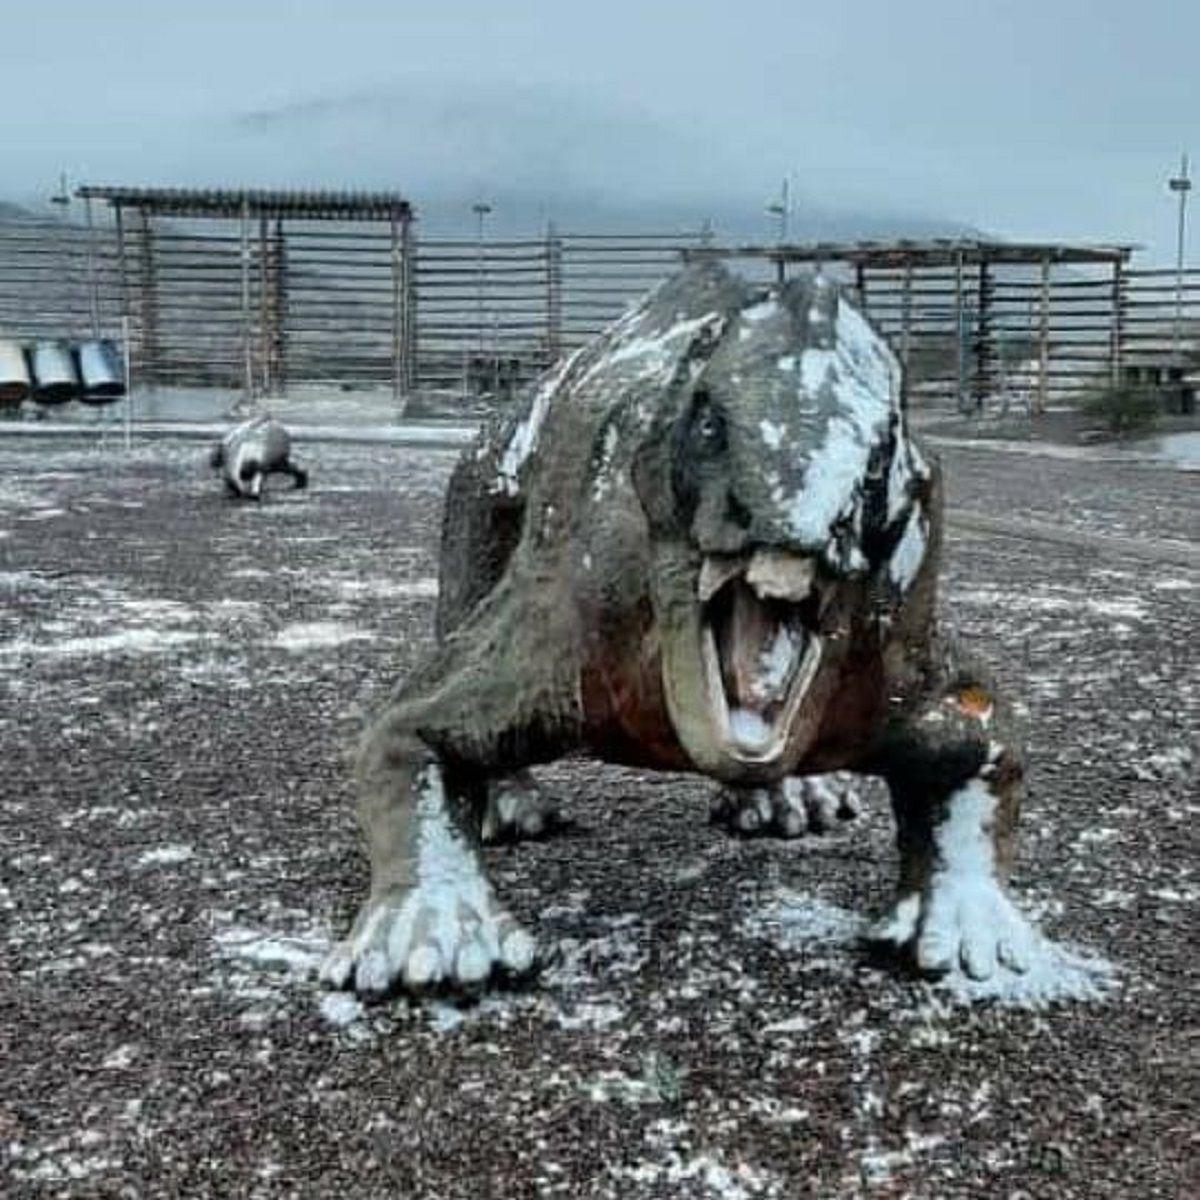 Nevó en Ischigualasto. Fuente: Info Valle Fértil.